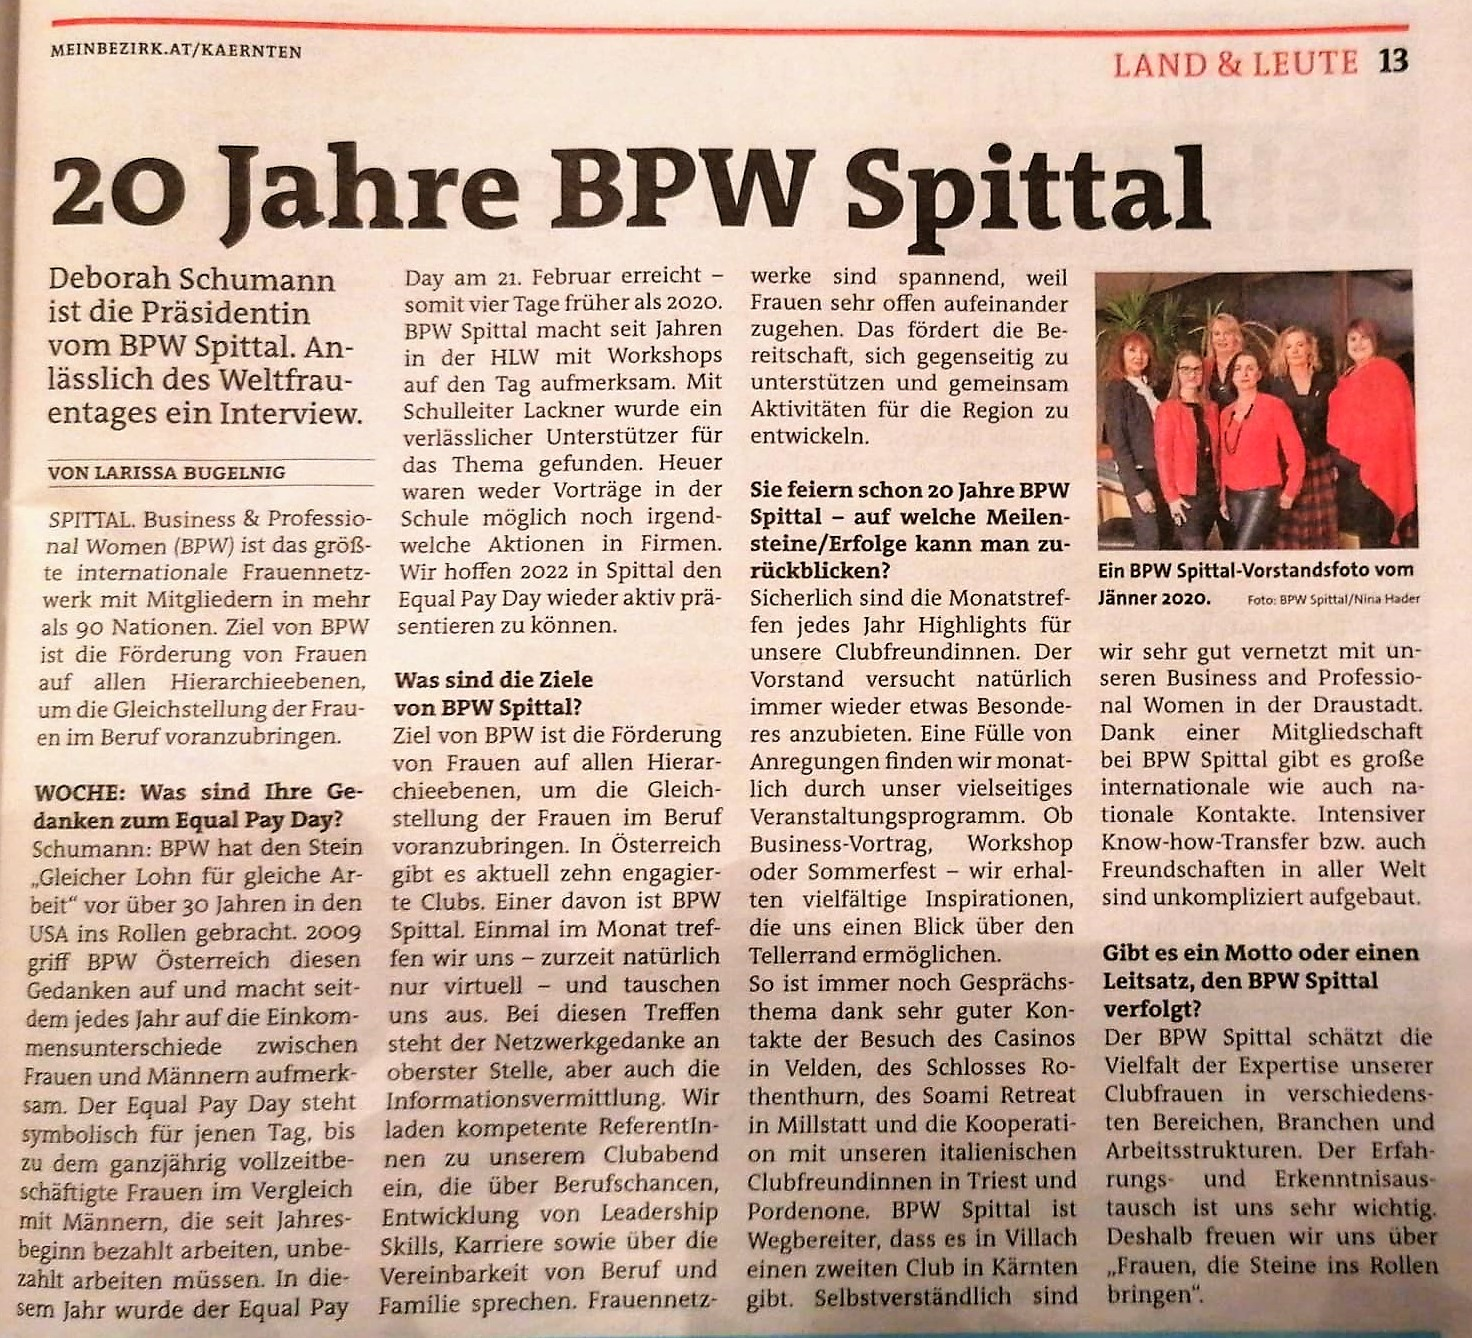 BPW Spittal in Meinbezirk